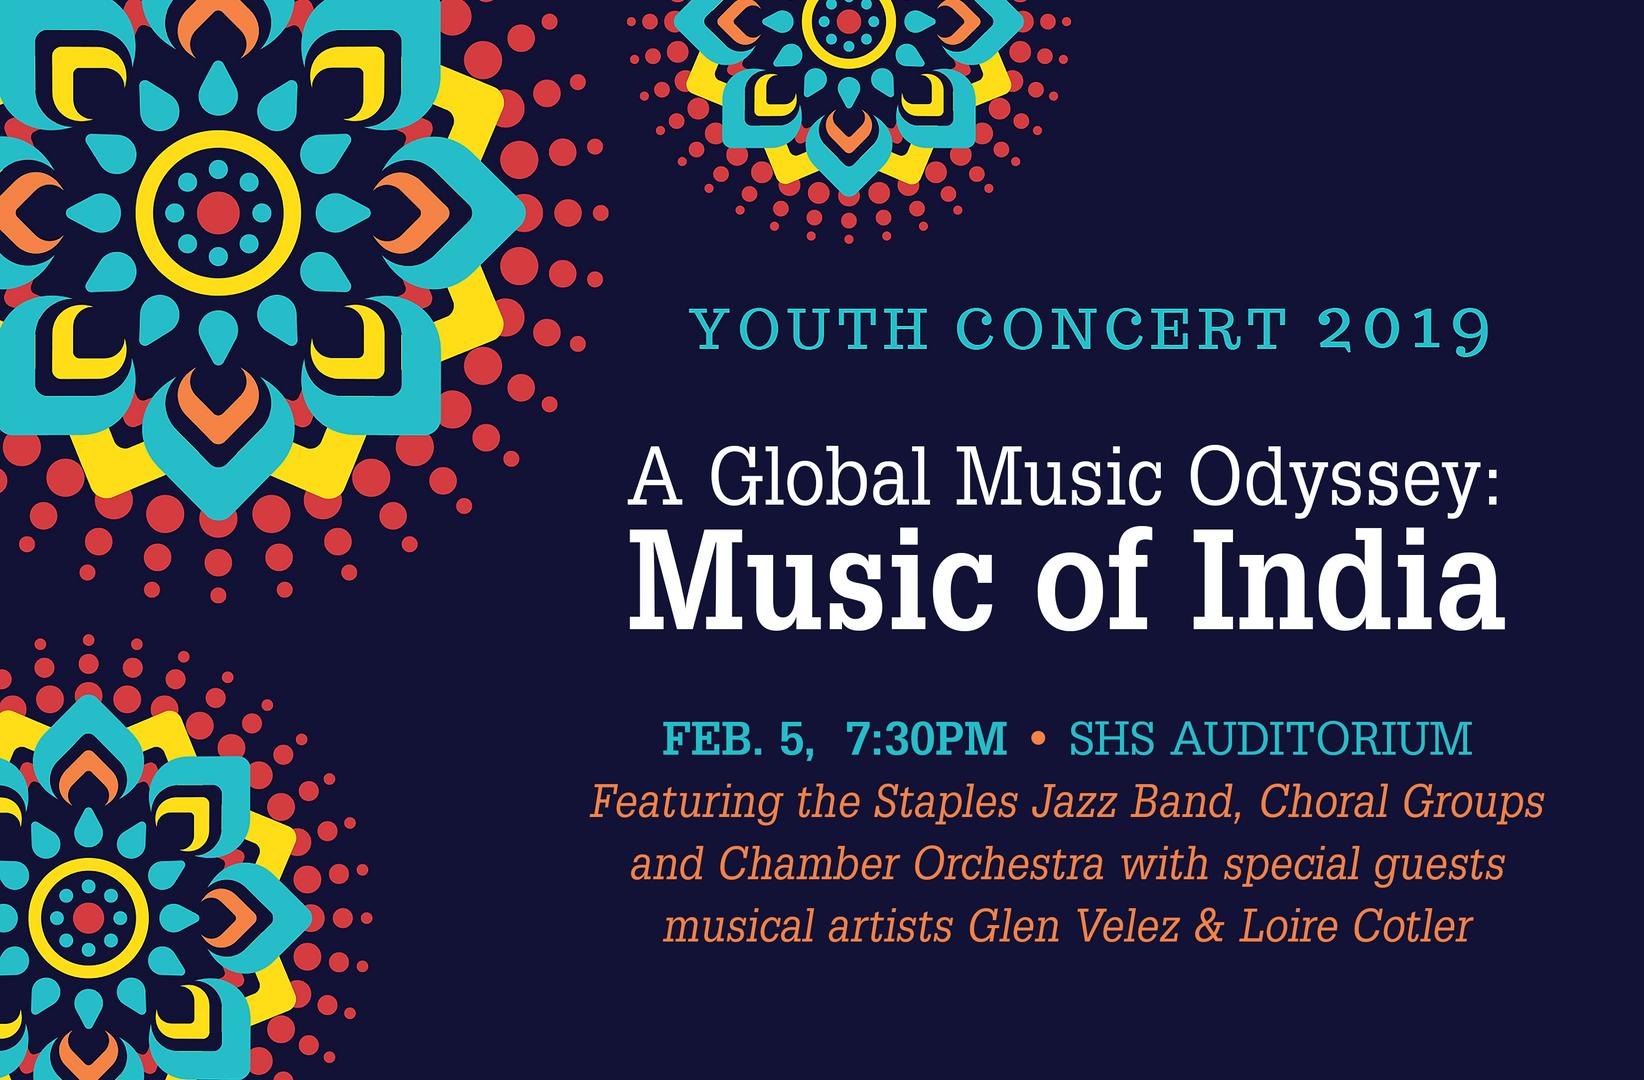 Youth Concert website banner.png